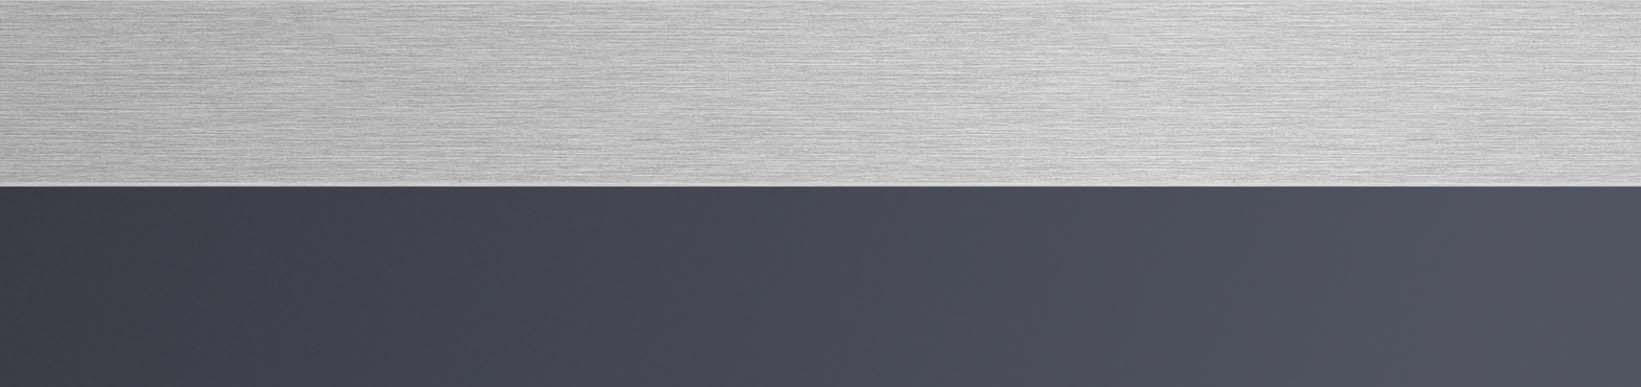 design drawer kitchen cabinets from v zug architonic. Black Bedroom Furniture Sets. Home Design Ideas